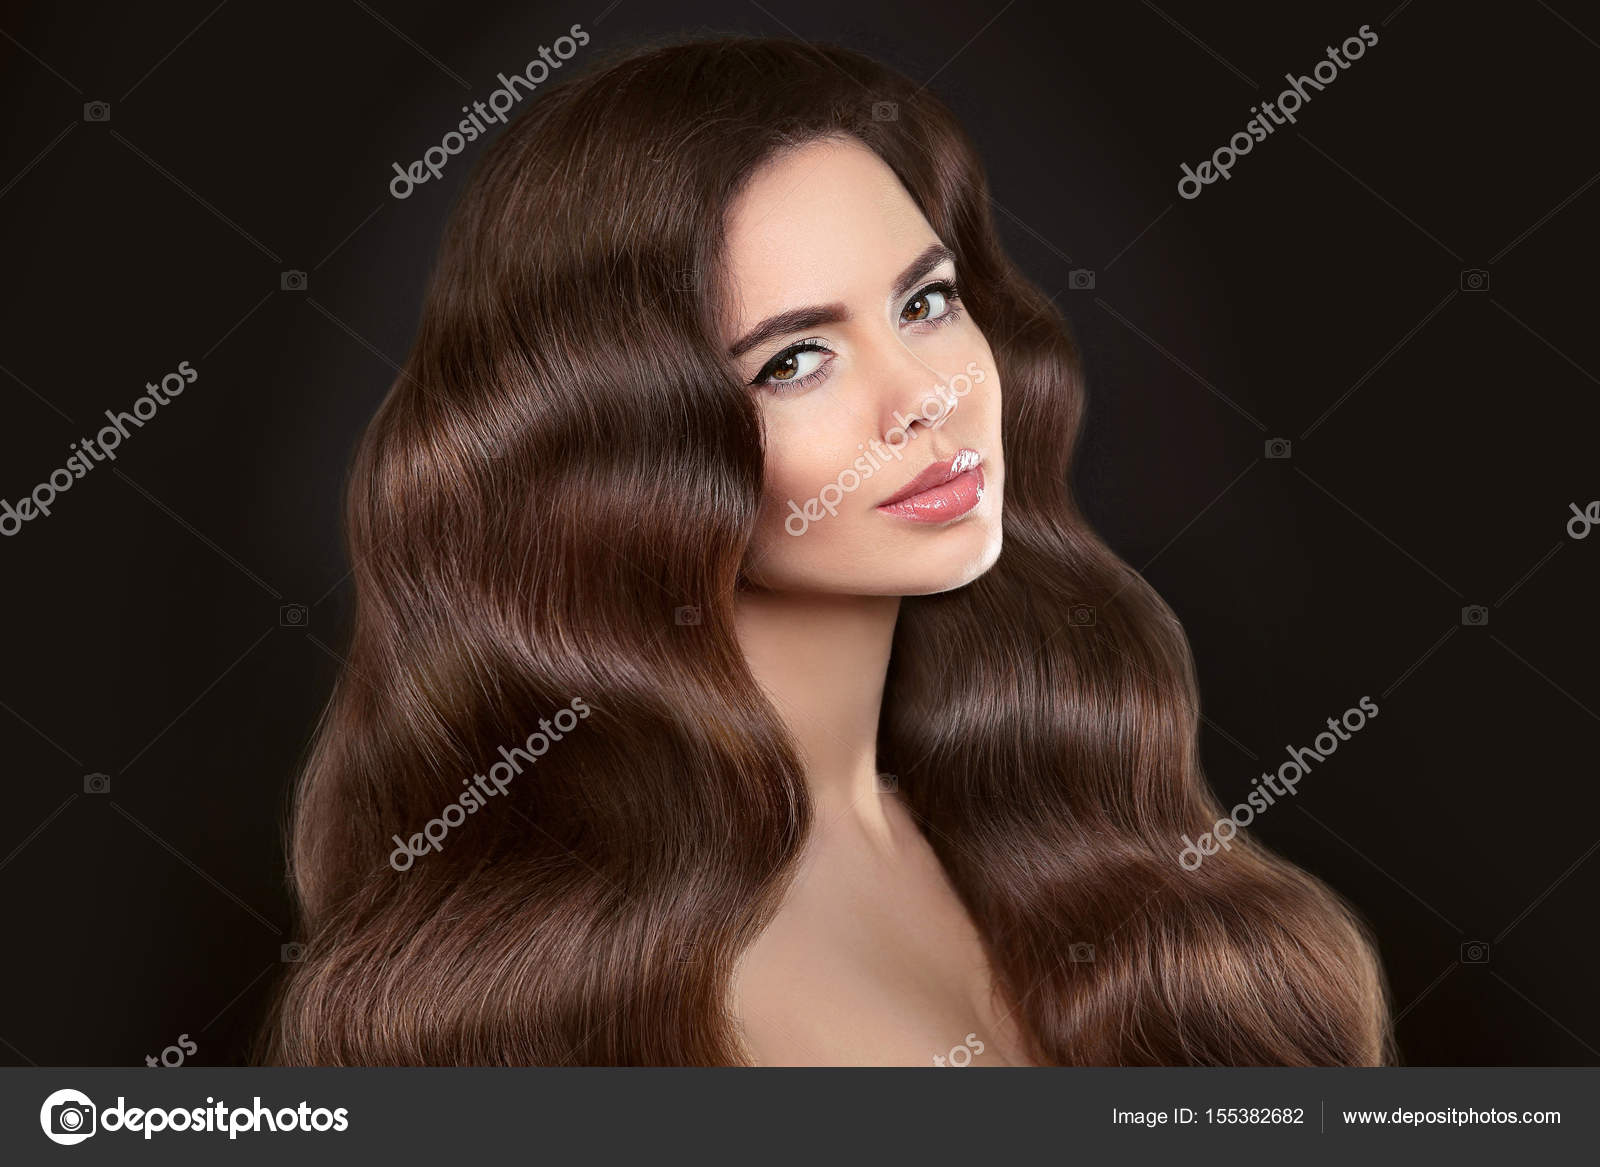 depositphotos 155382682-stock-photo-healthy-hair-beautiful-model-girl.jpg 60d773e252956